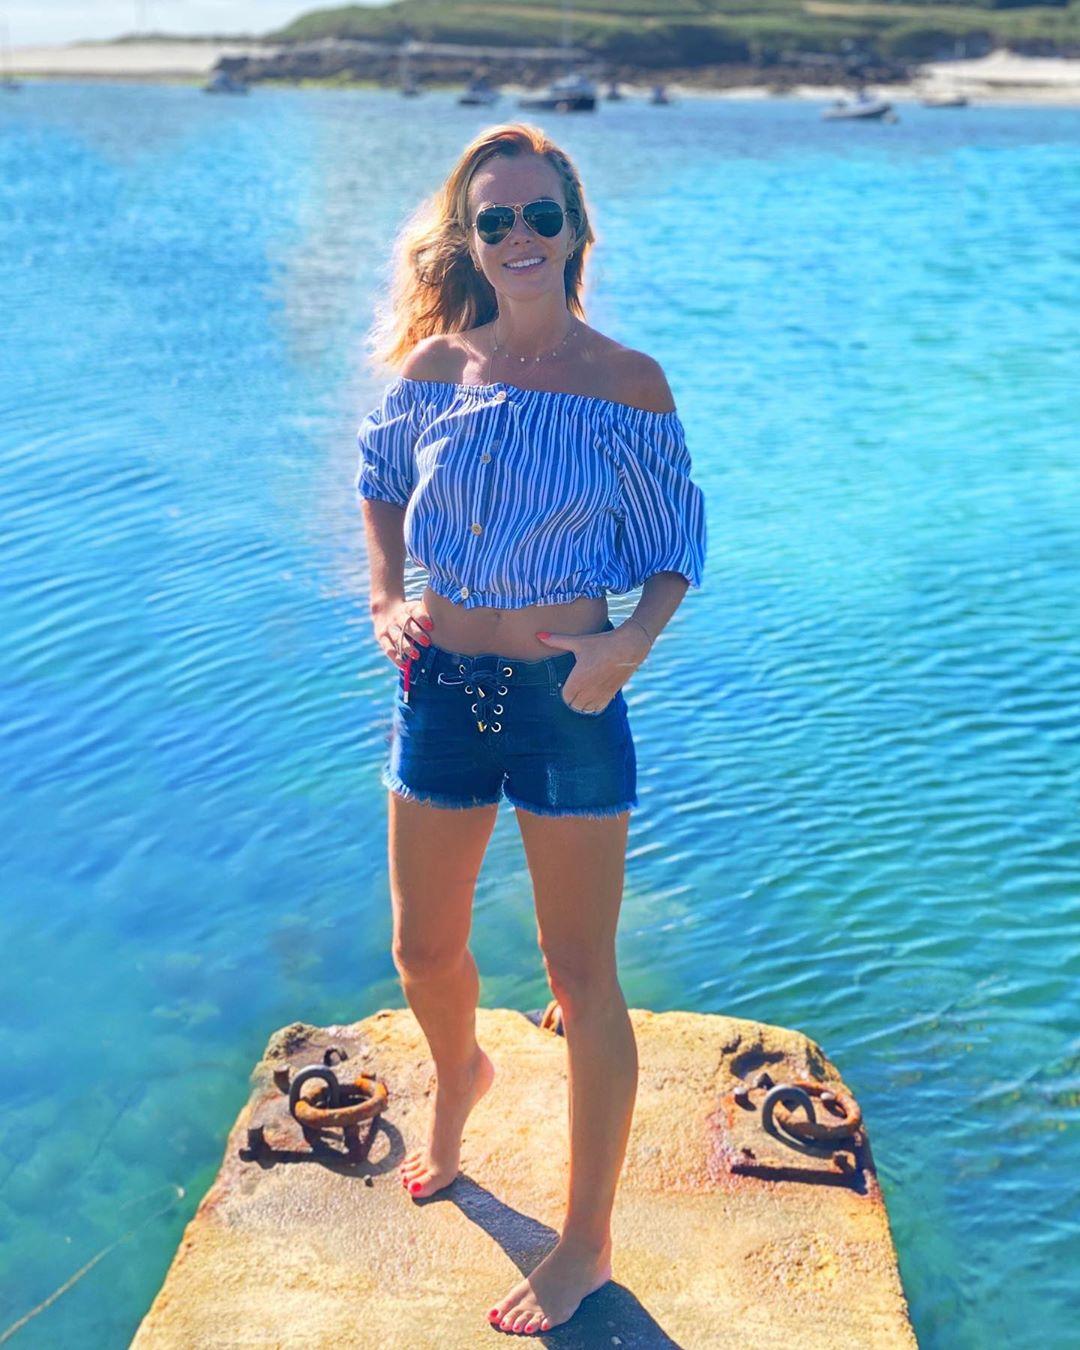 Потрясающее тело 49-летней телеведущей Аманды Холден